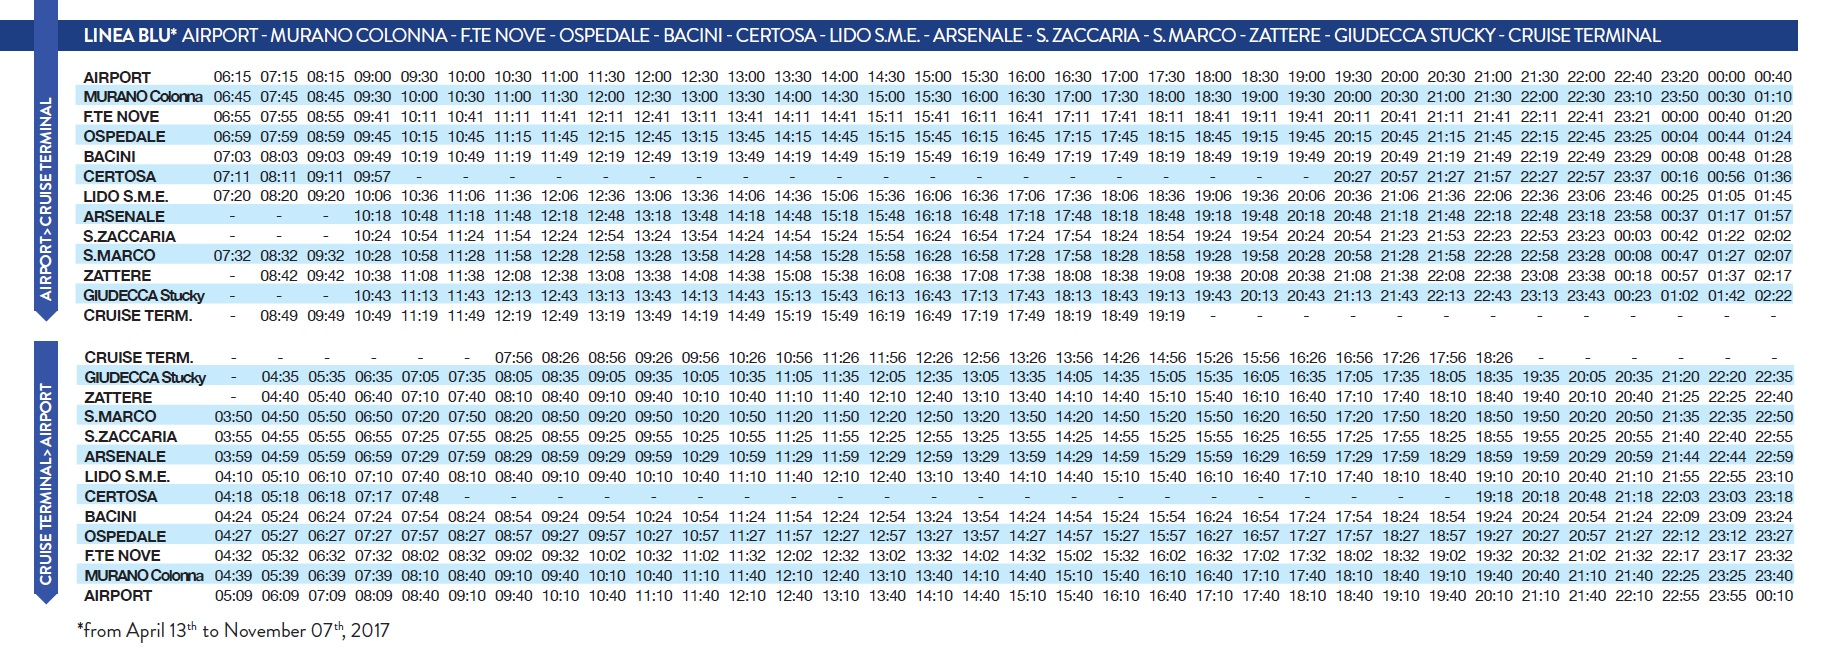 Linea Blu summer 2017 timetable